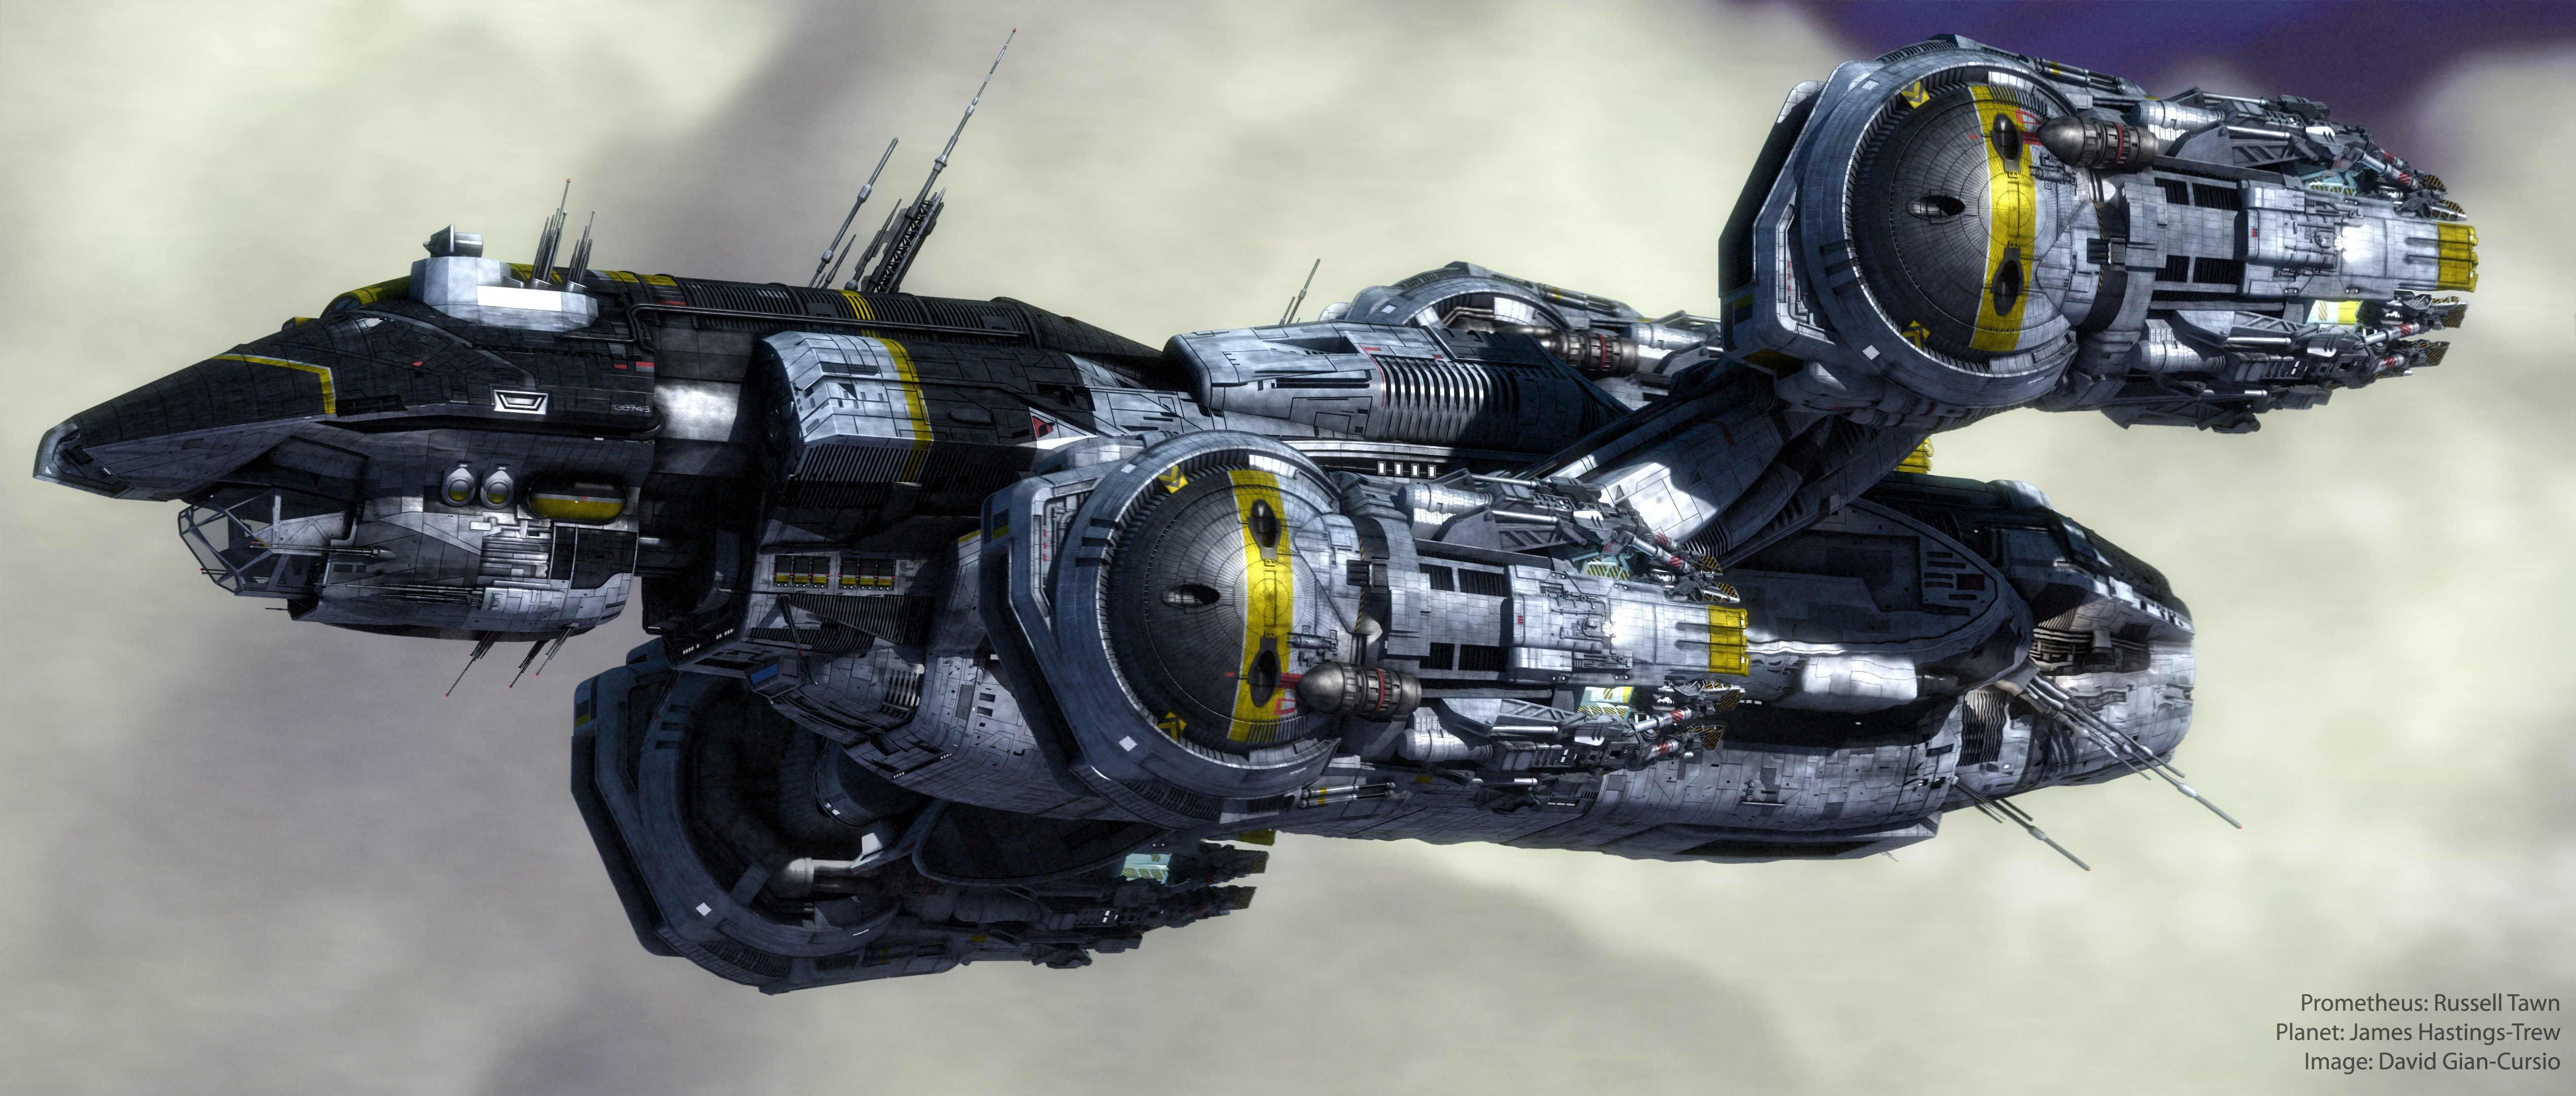 PROMETHEUS adventure mystery sci-fi futuristic spaceship ...